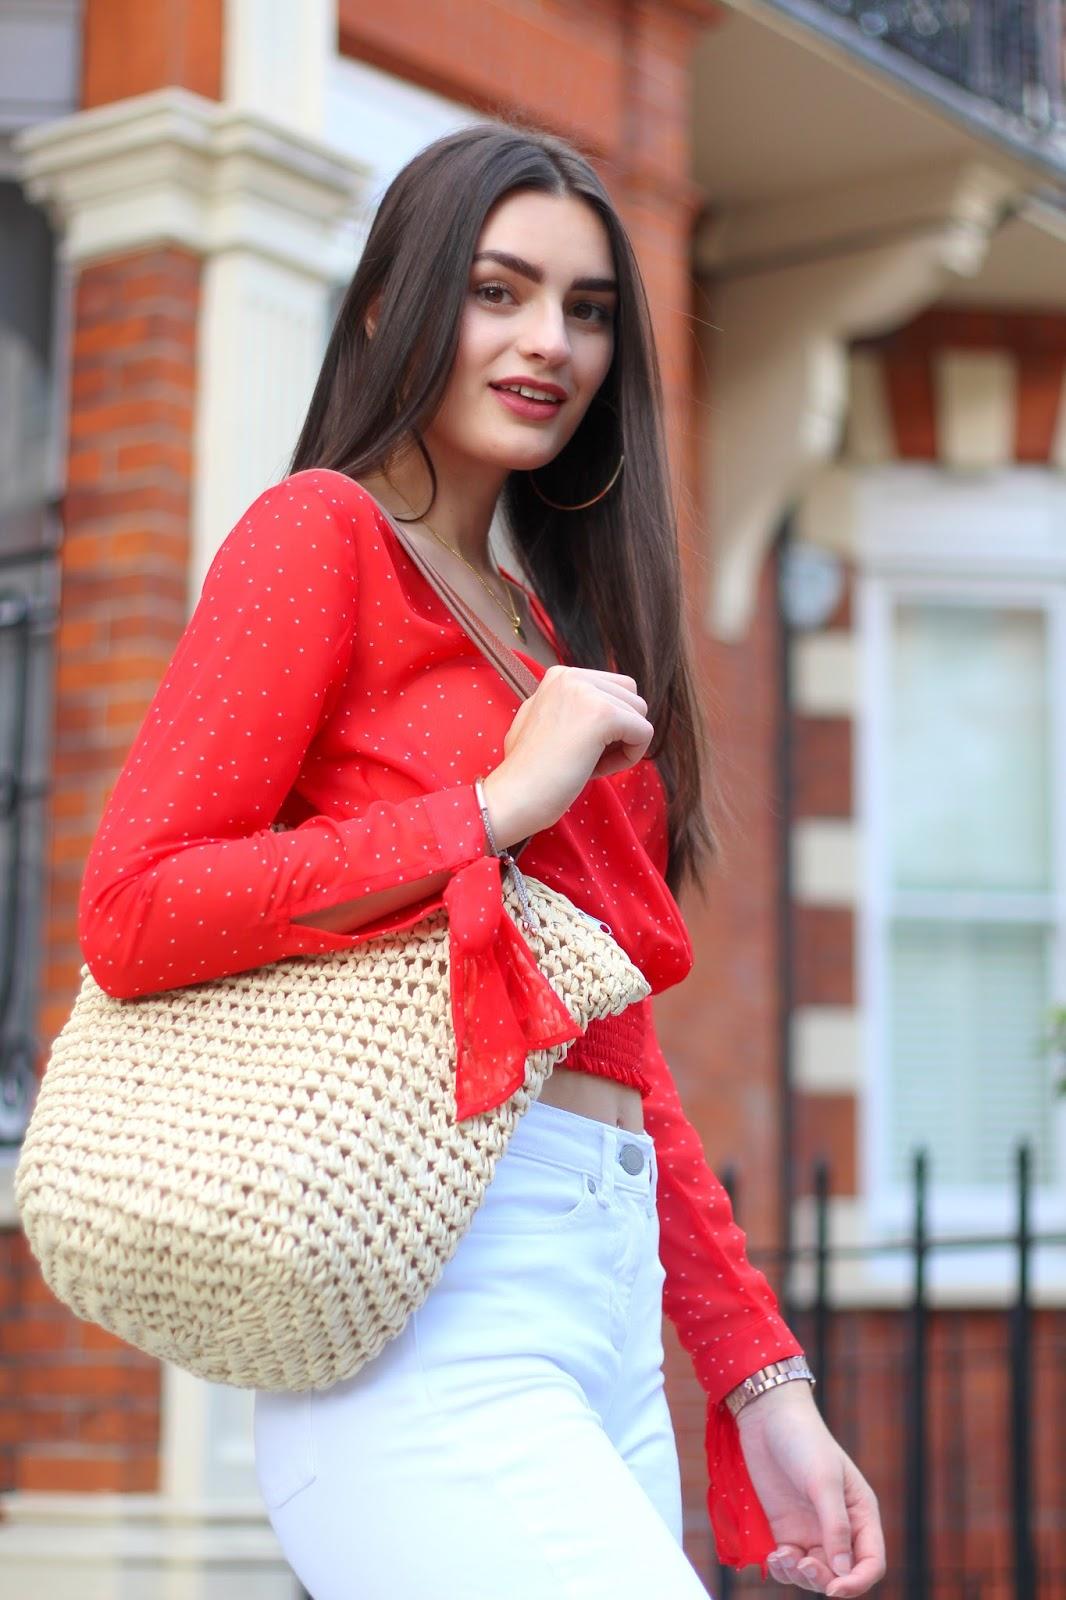 peexo summer accessories straw bag m&s